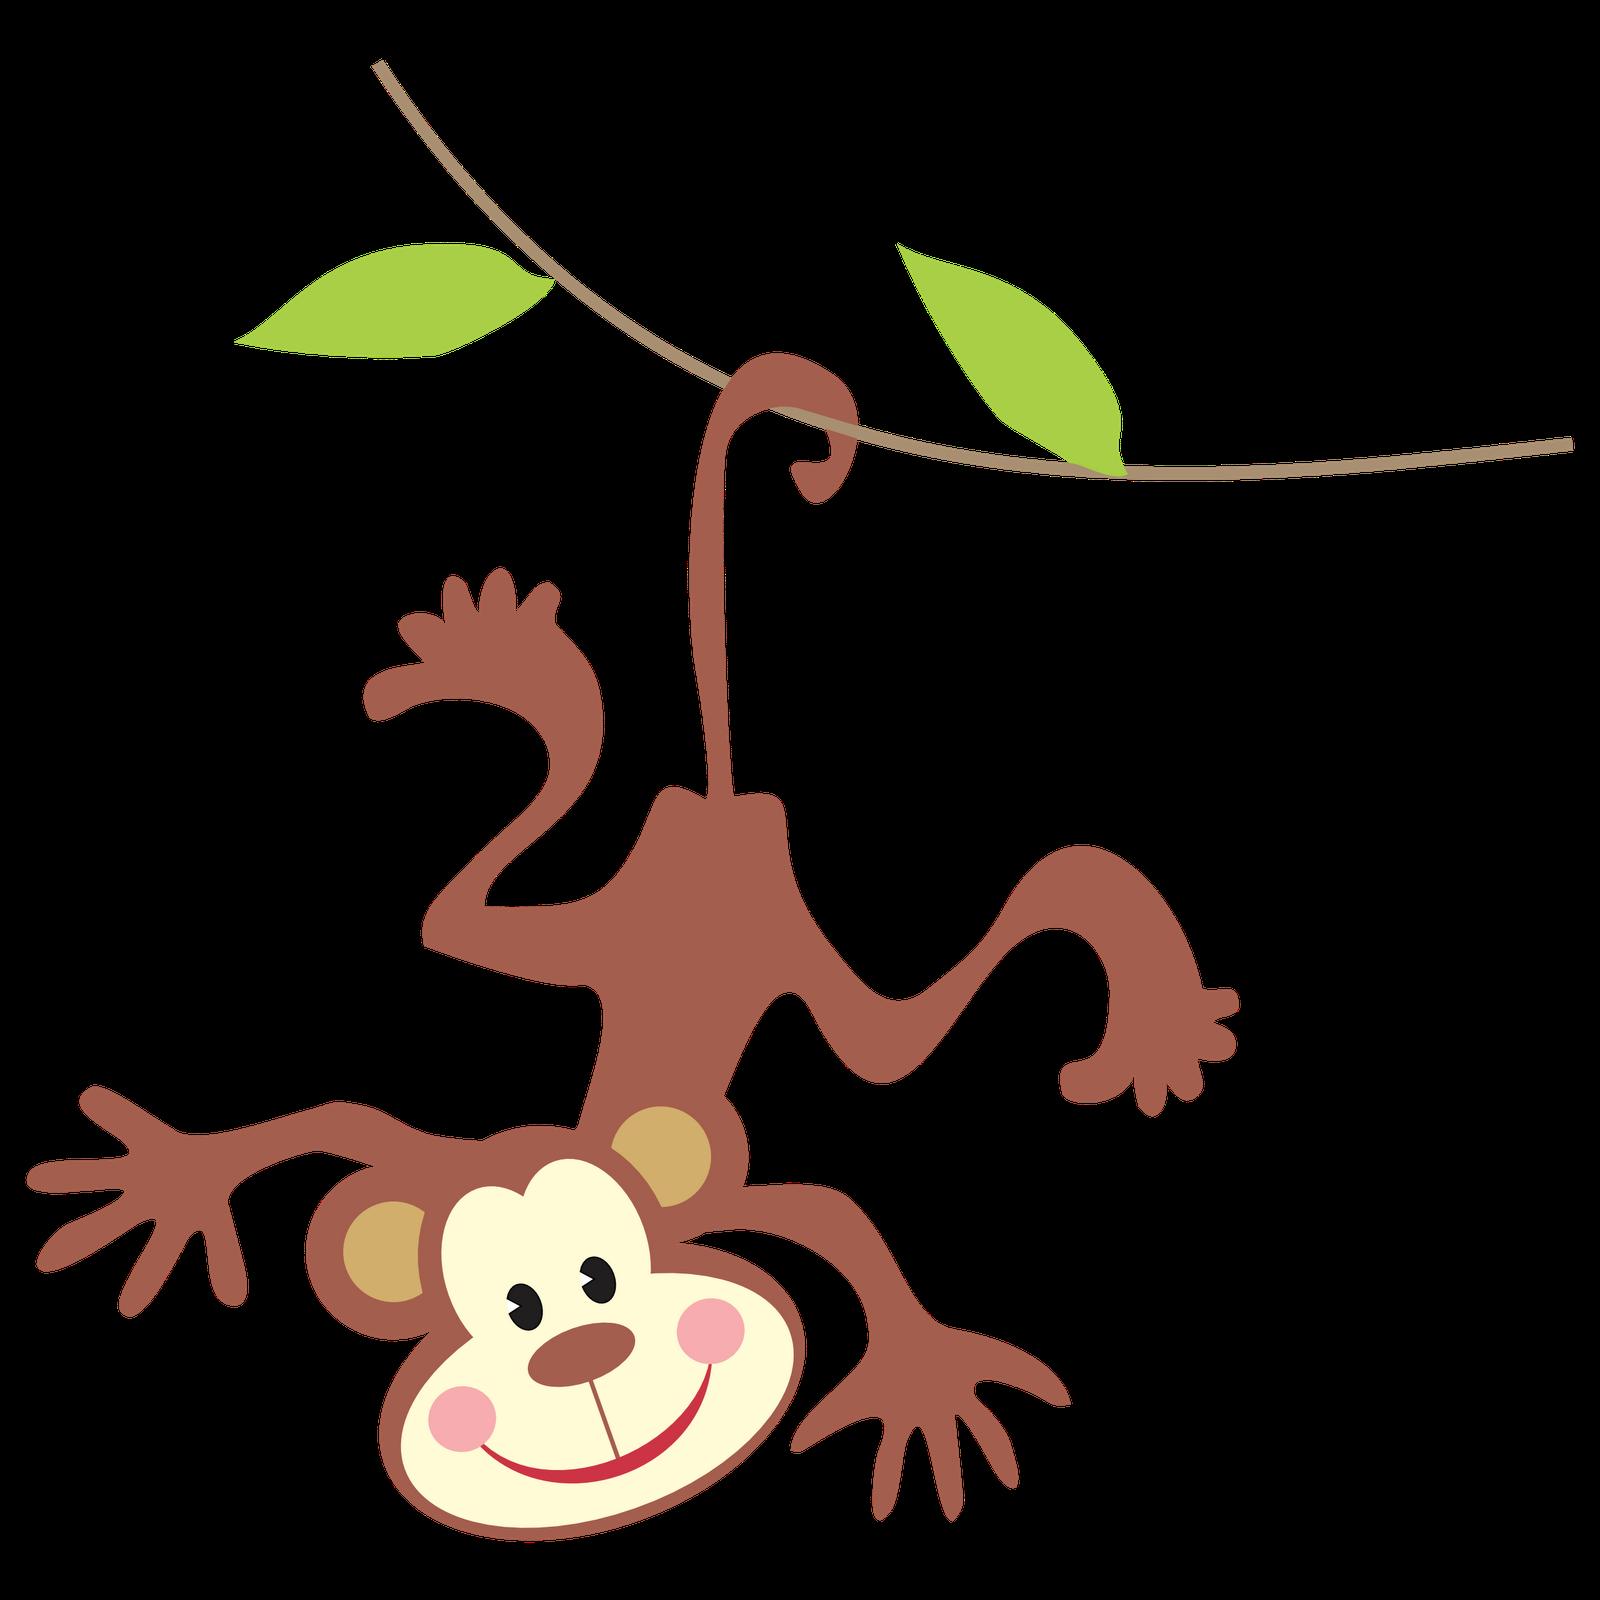 pin by dara tata on 2016 2028 pinterest monkey rh pinterest co uk clip art monkeys pictures clip art monkeys cartoon